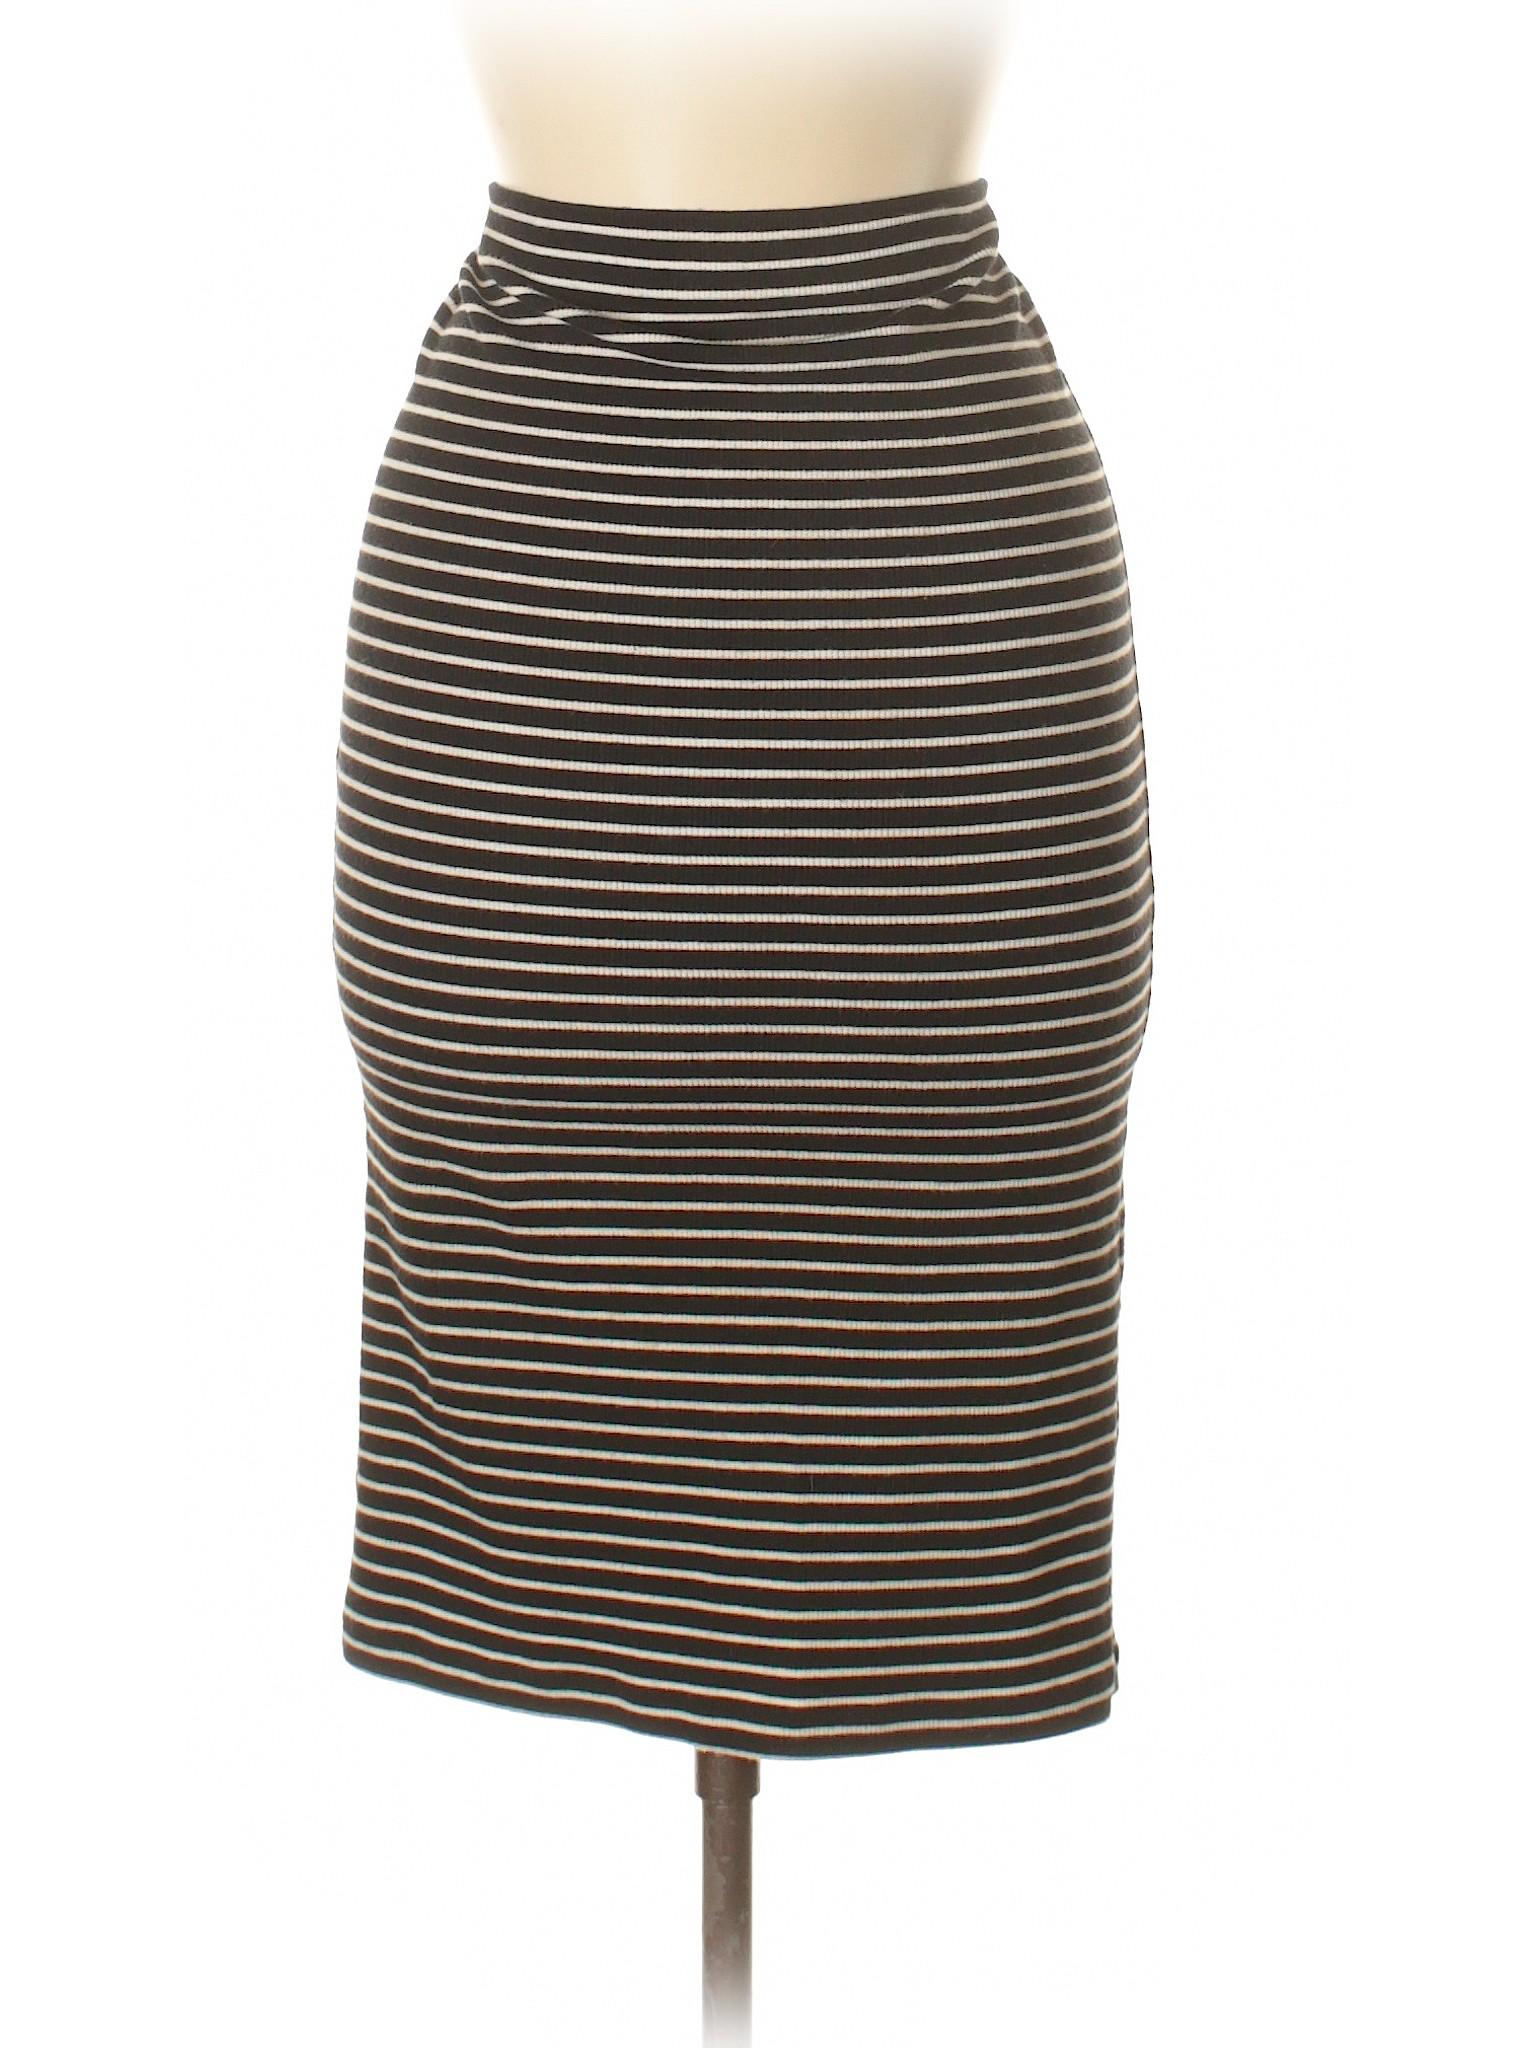 Skirt Boutique Boutique Casual Casual Boutique Casual Skirt Skirt Skirt Boutique Casual xxYHqv